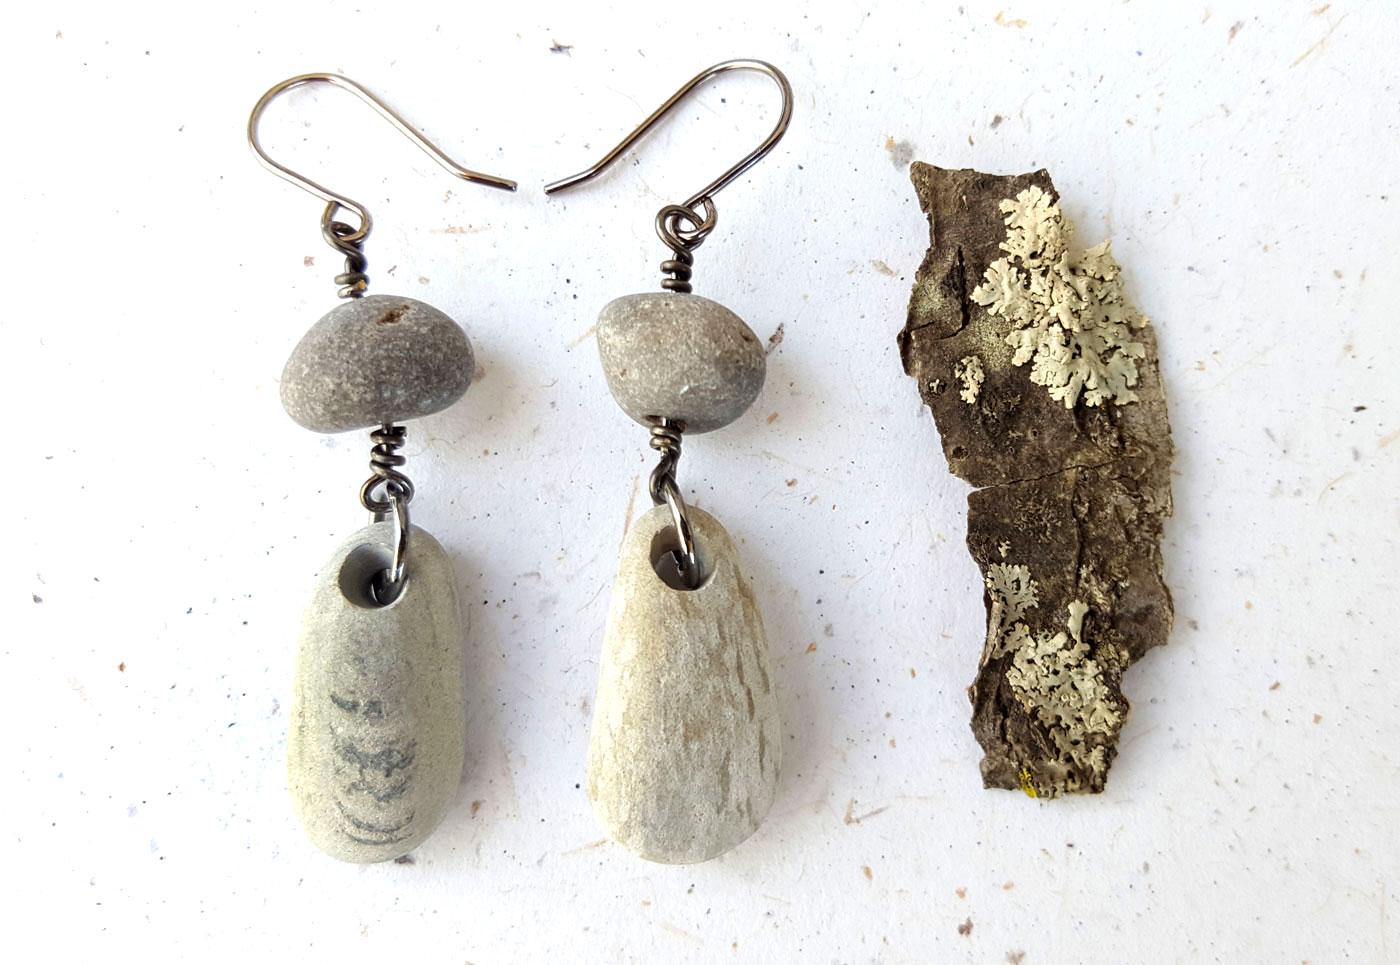 River rock earrings by Jenny Hoople of Authentic Arts